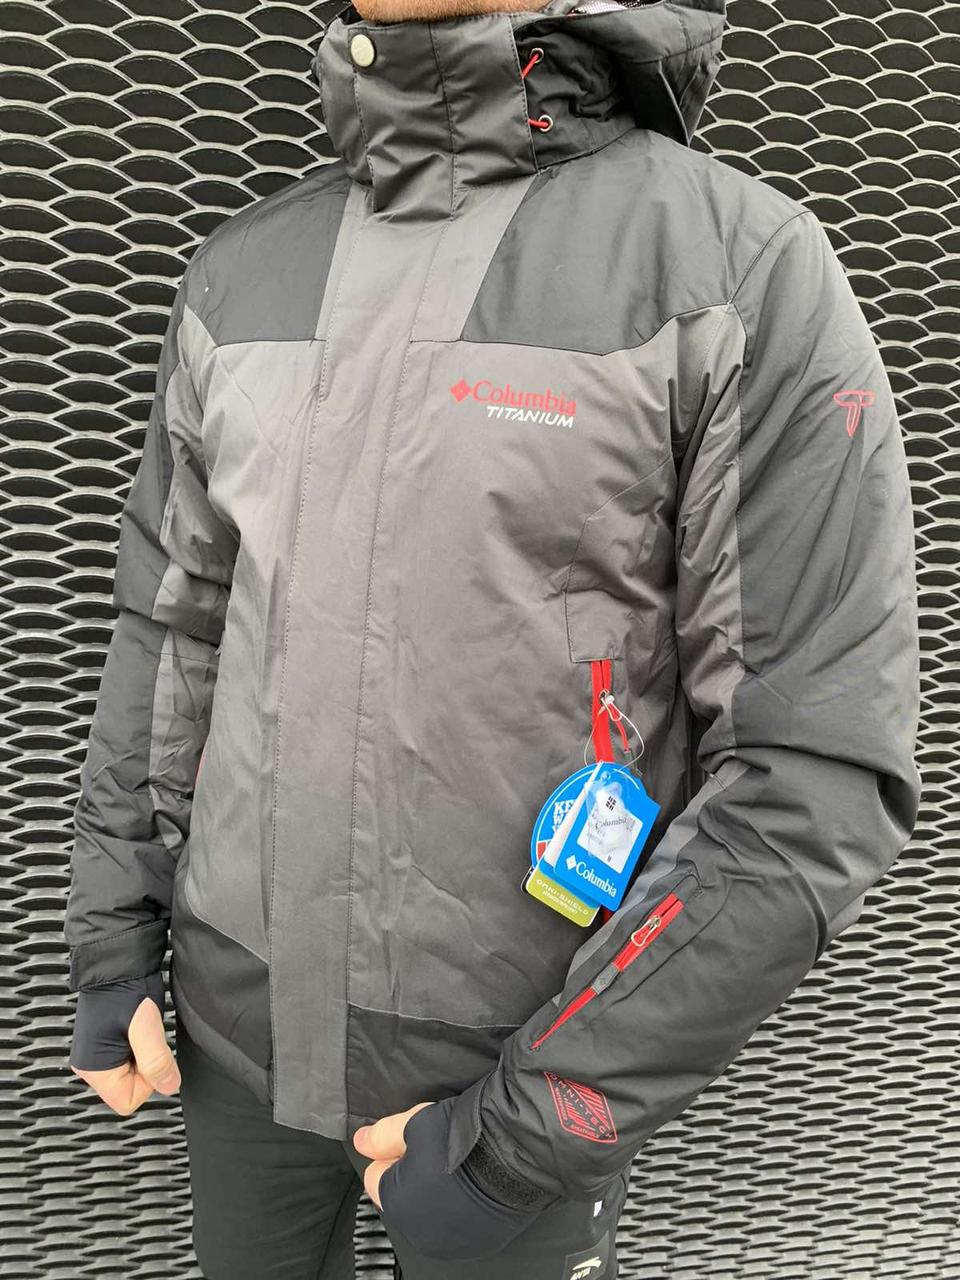 Мужская зимняя куртка Columbia Titanium серый